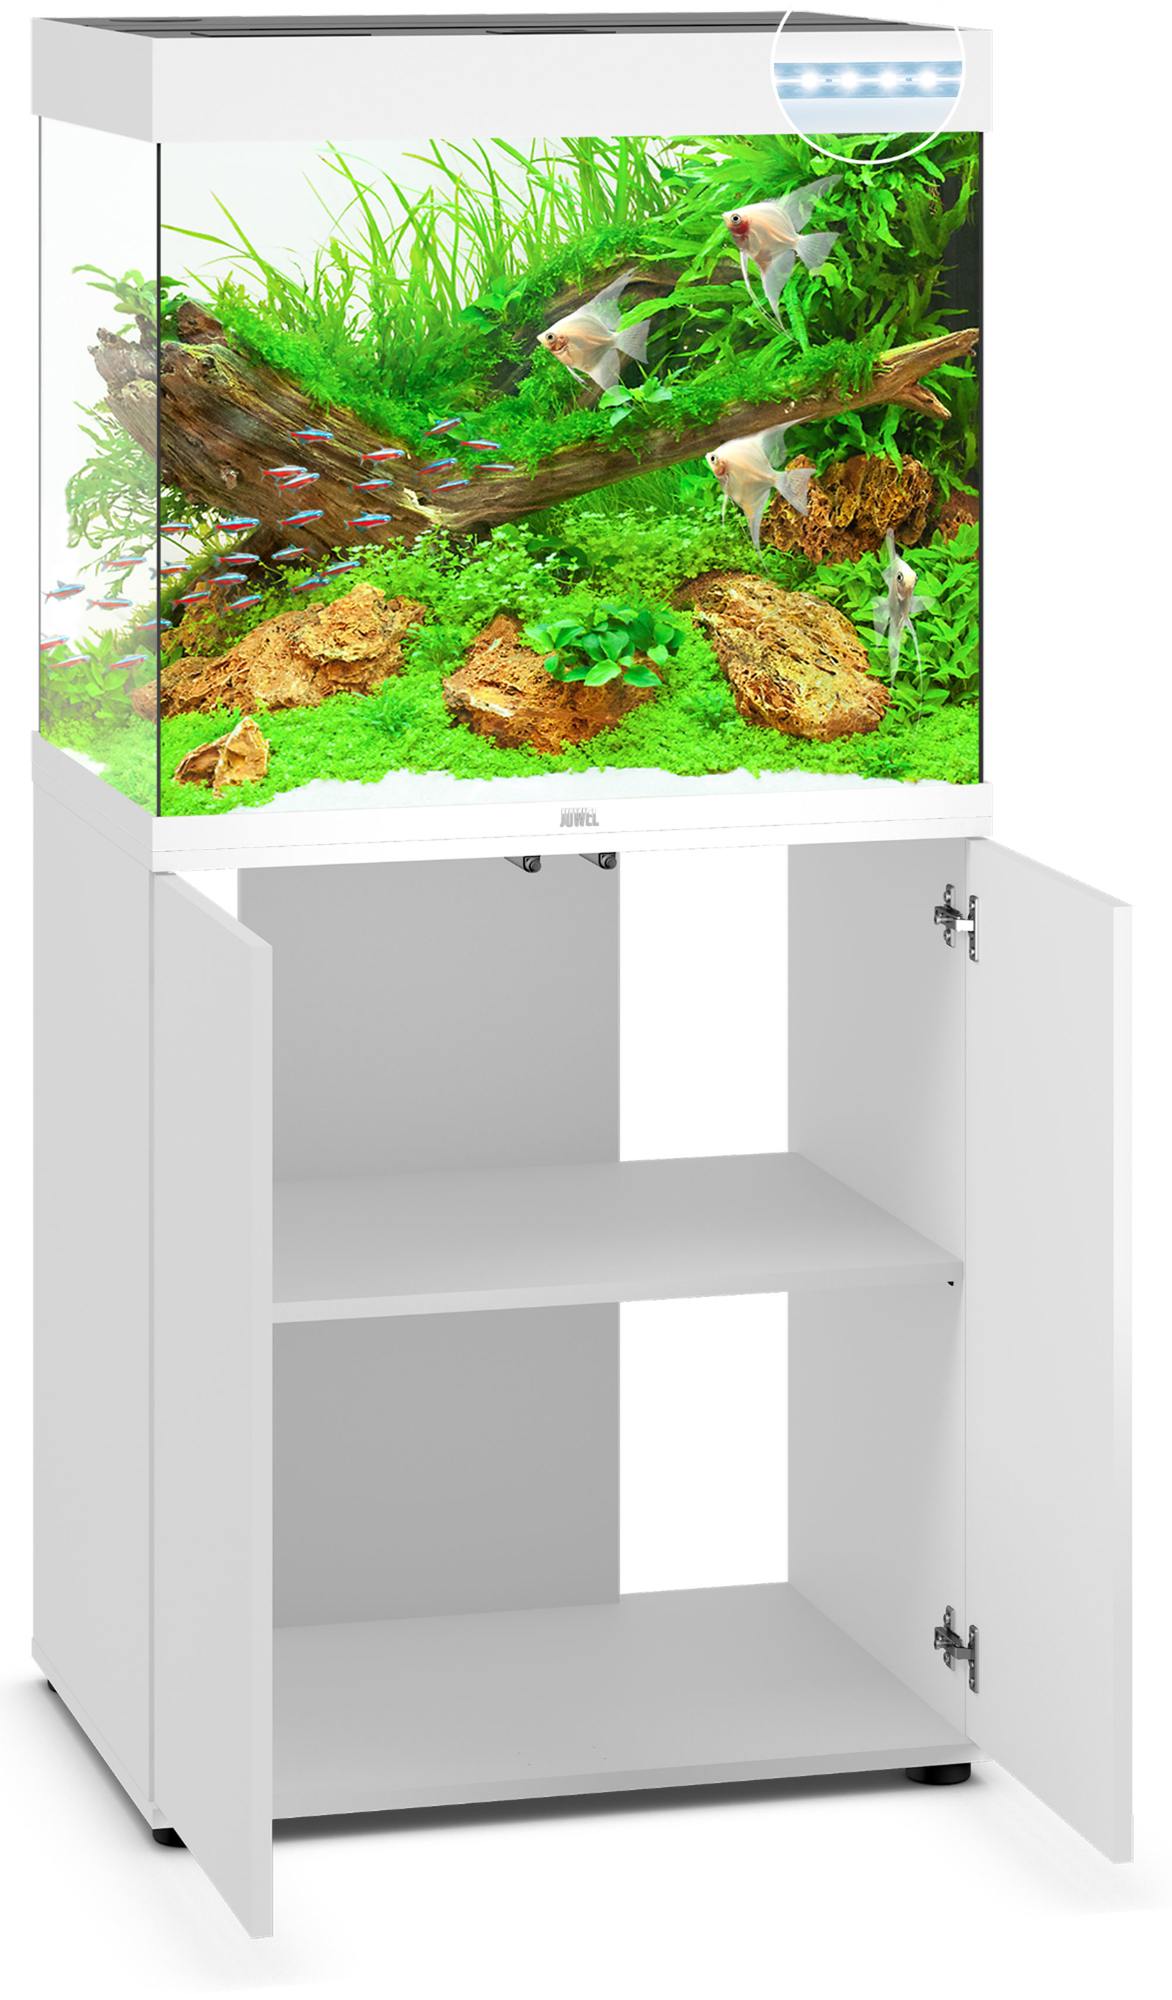 Juwel lido 200 led aquarium mit unterschrank ebay for Aquarium mit unterschrank